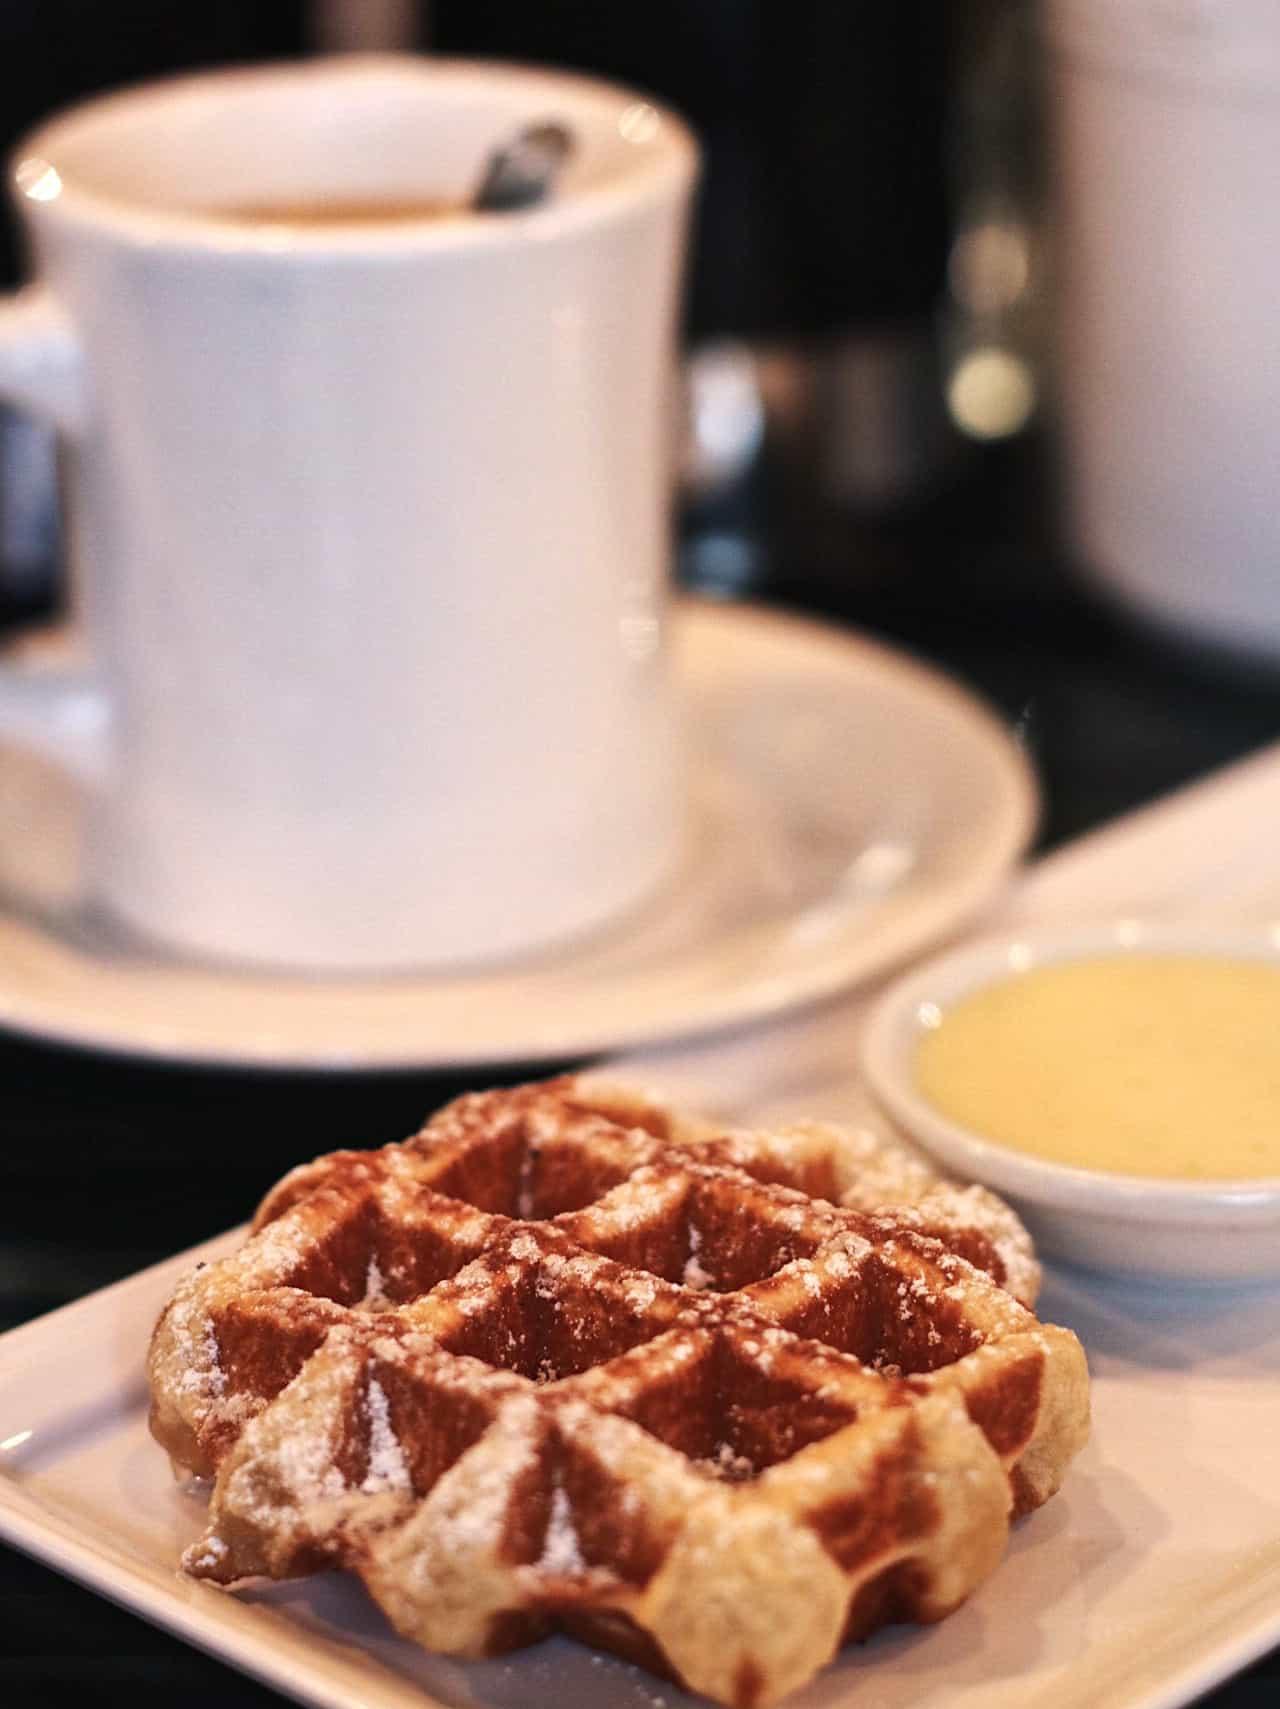 Cafe Medina in Vancouver, British Columbia